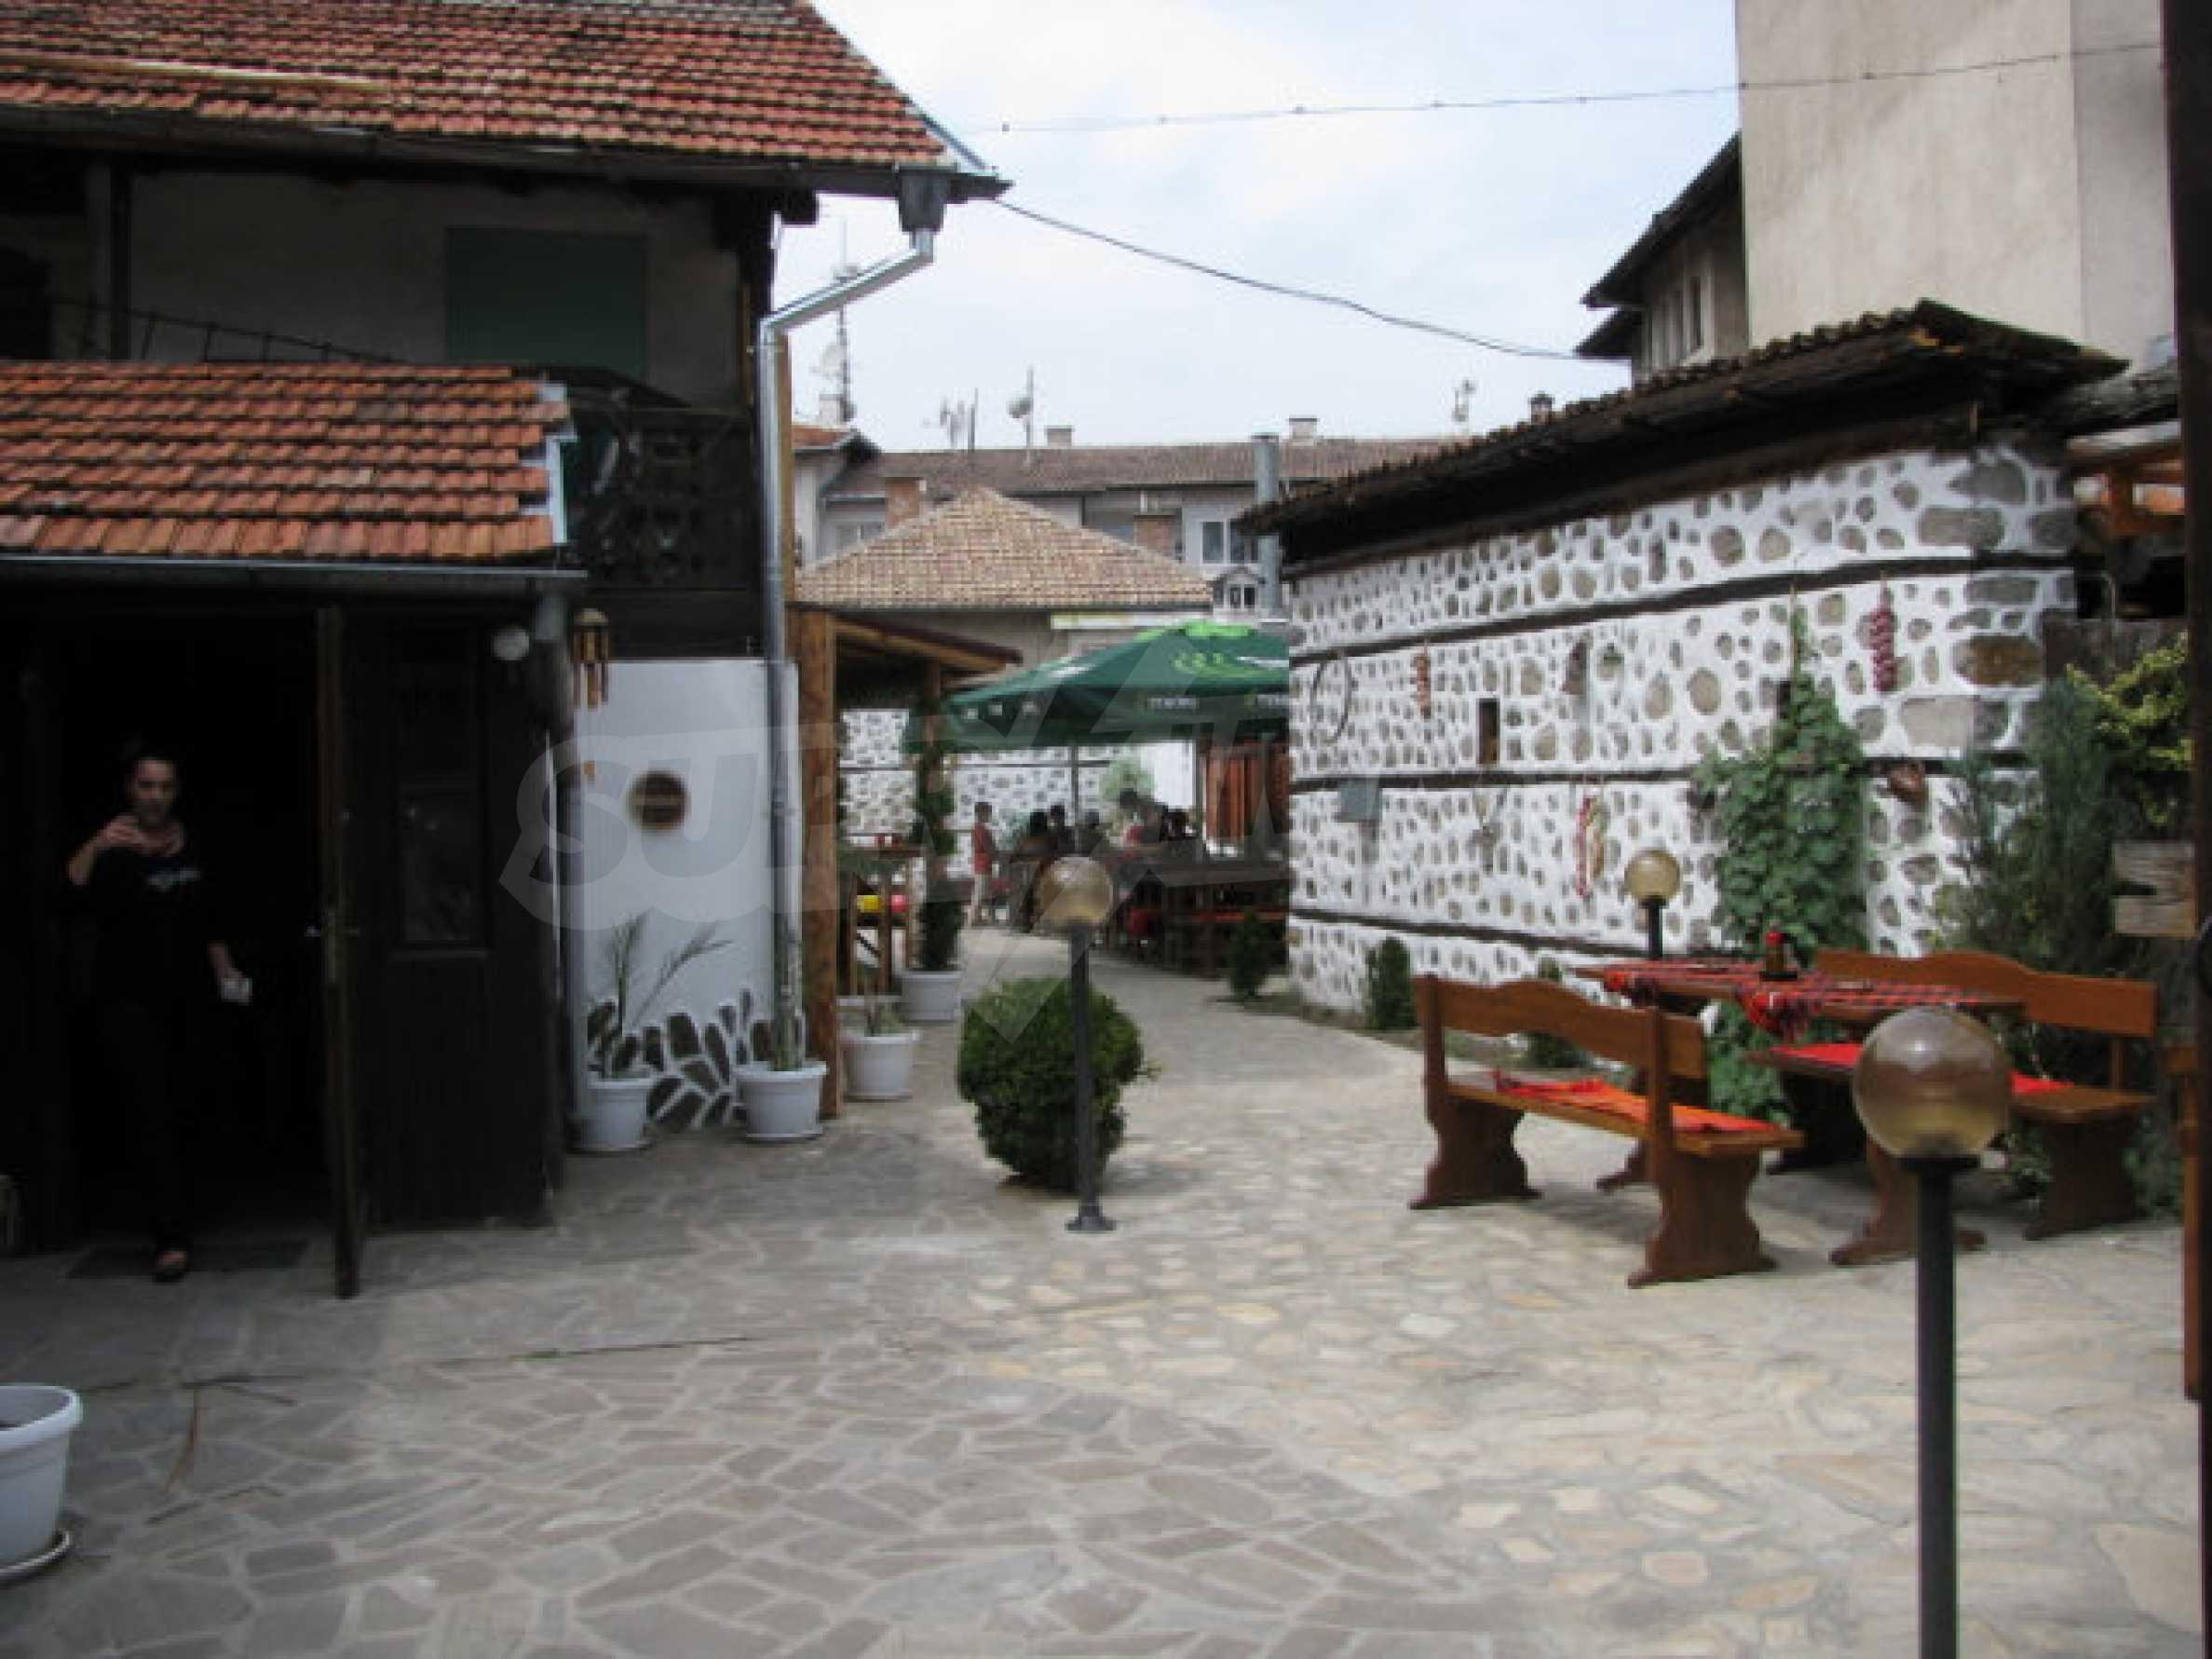 Tavern for sale in winter resort Bansko